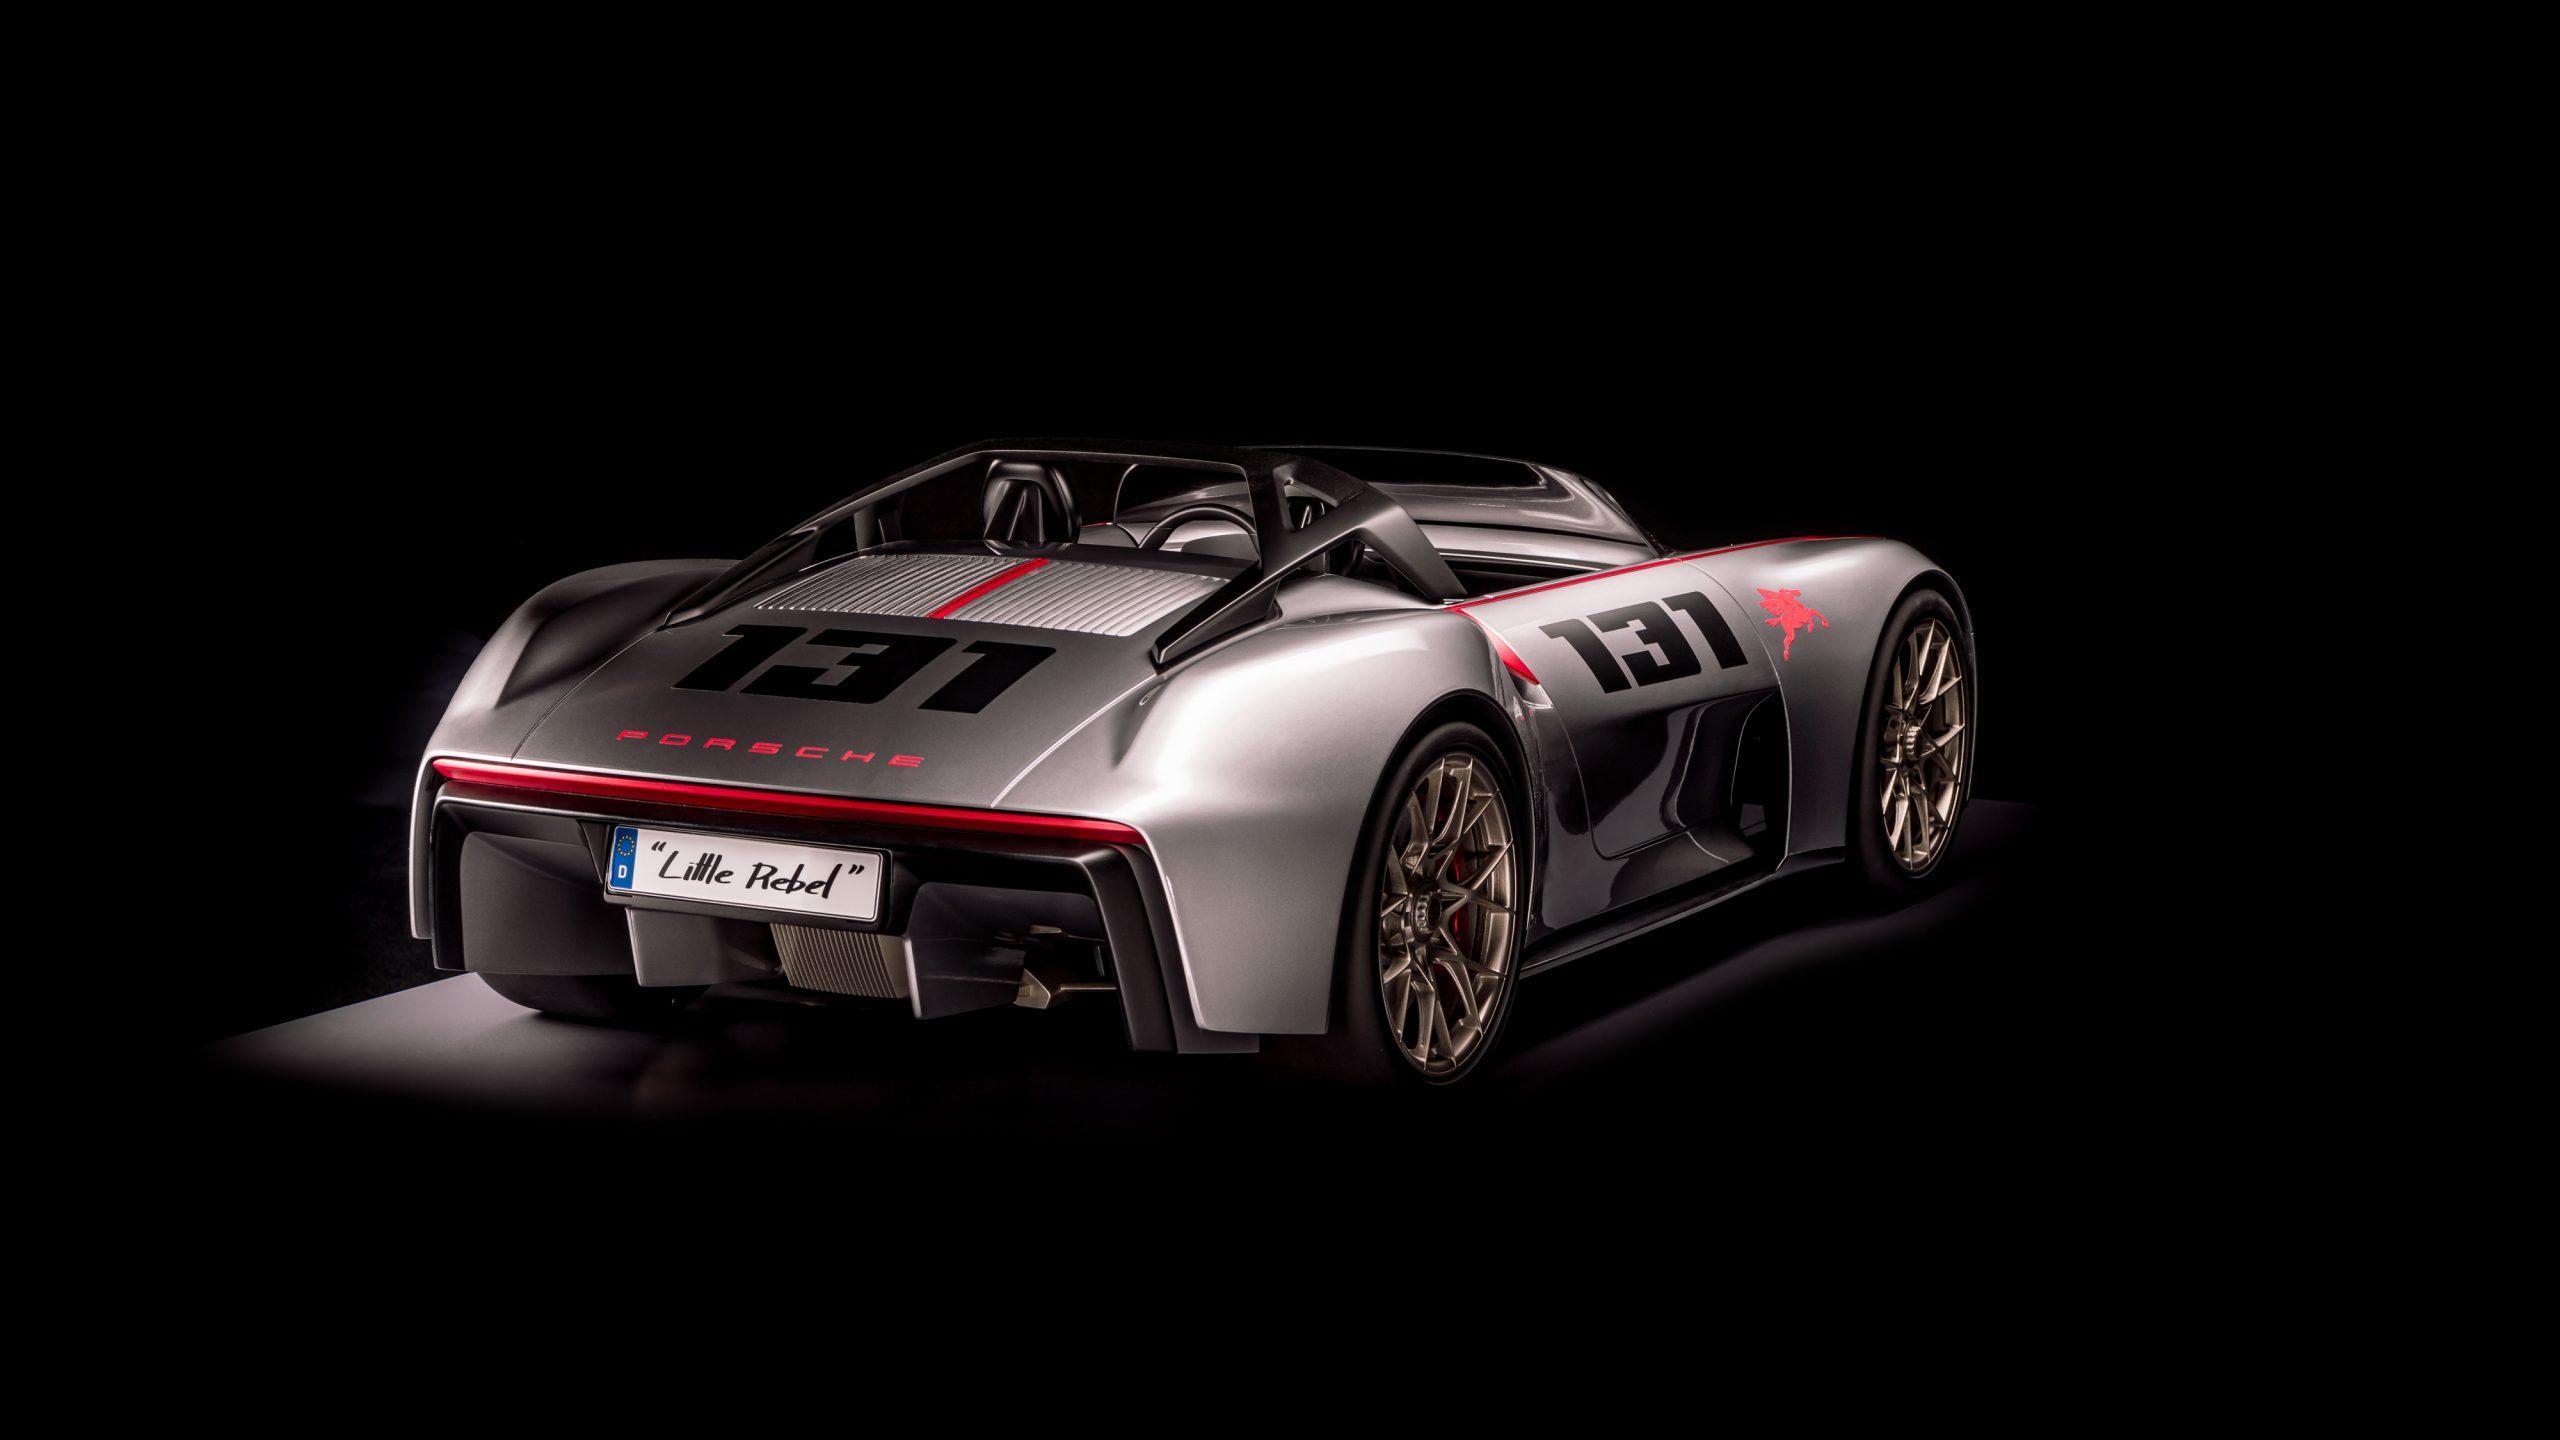 Porsche vision spyder rear